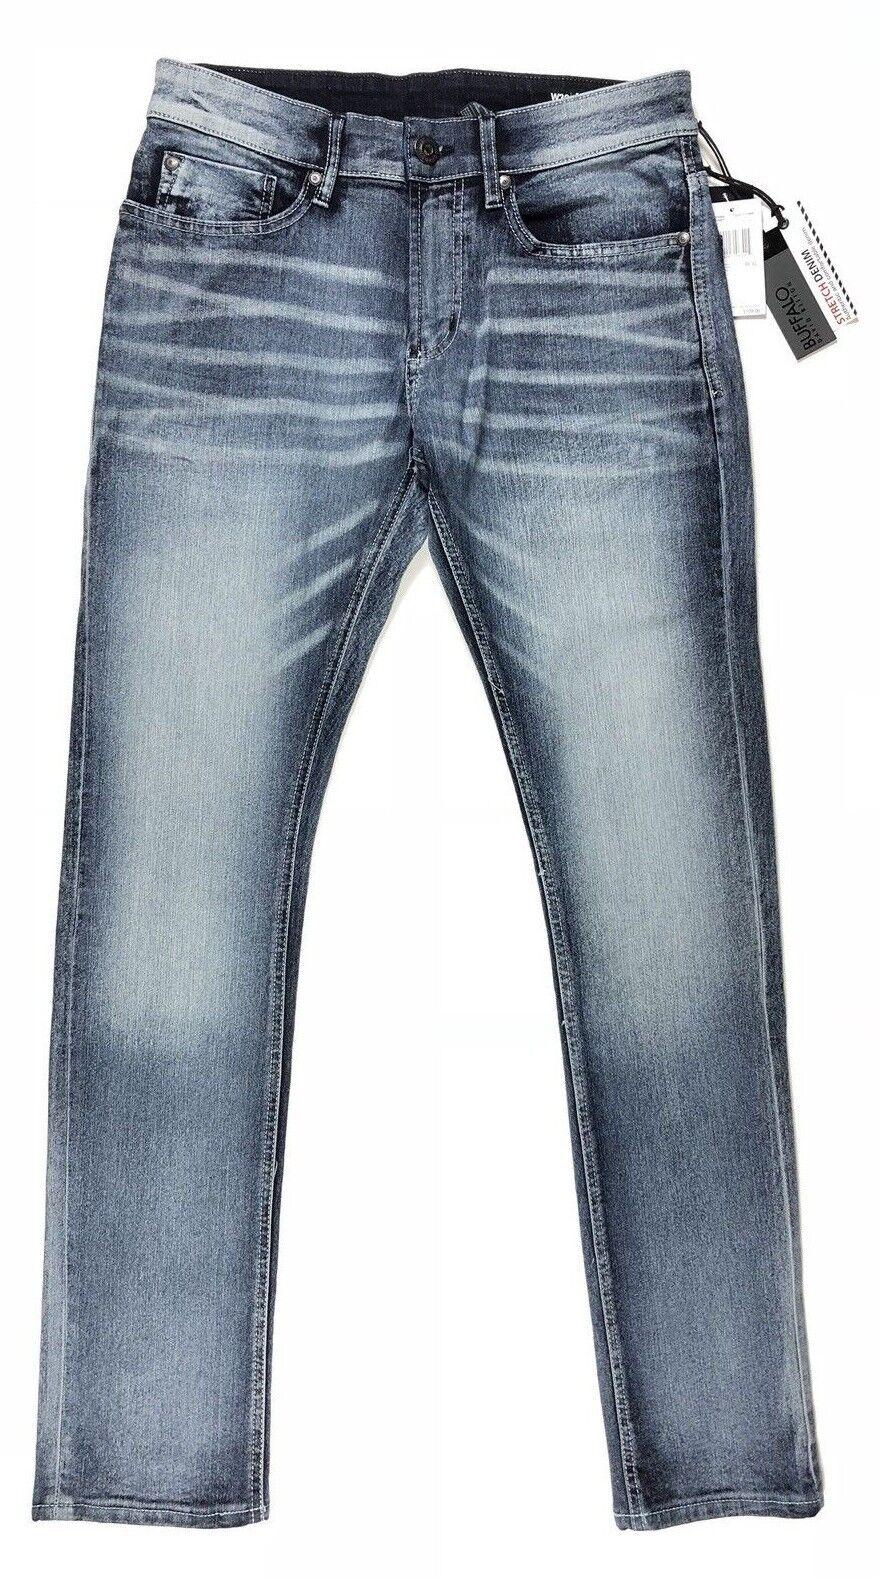 Buffalo David Bitton Jean Ash X Super Skinny Stretch Medium Wash Whiskered Size